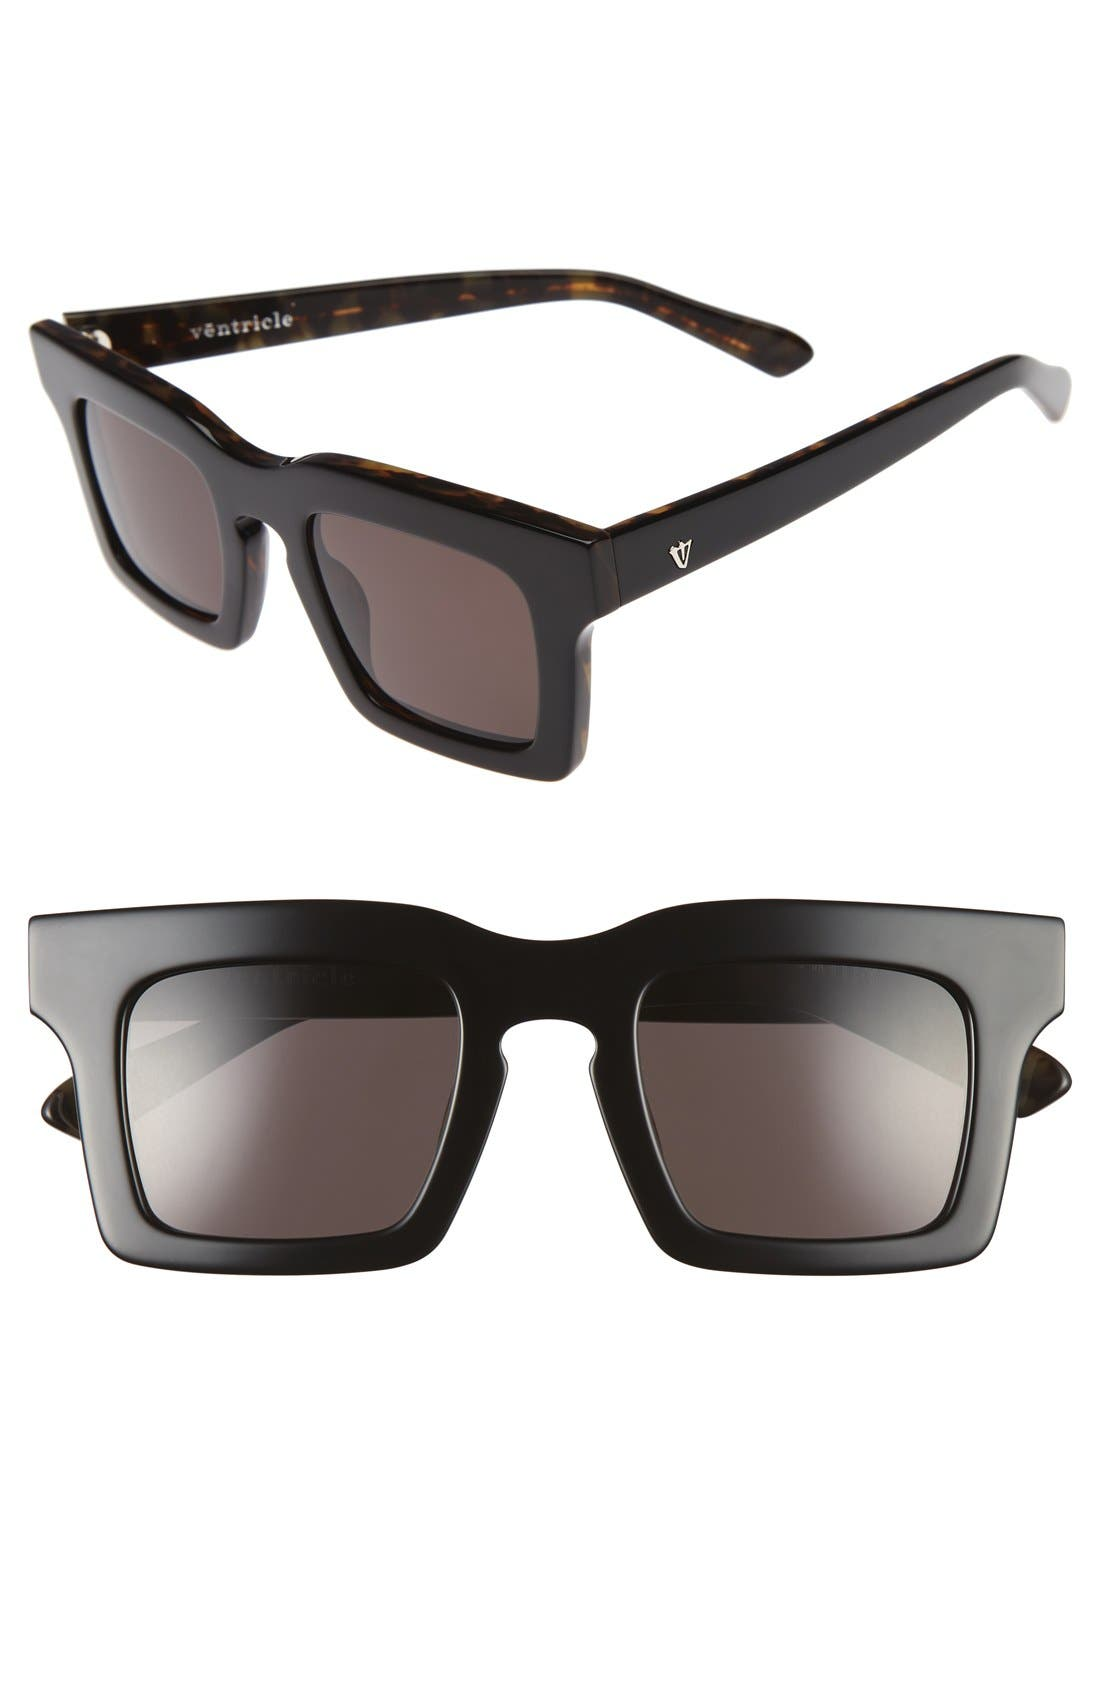 Ventricle 50mm Sunglasses,                         Main,                         color, Gloss Black/ Tortoise